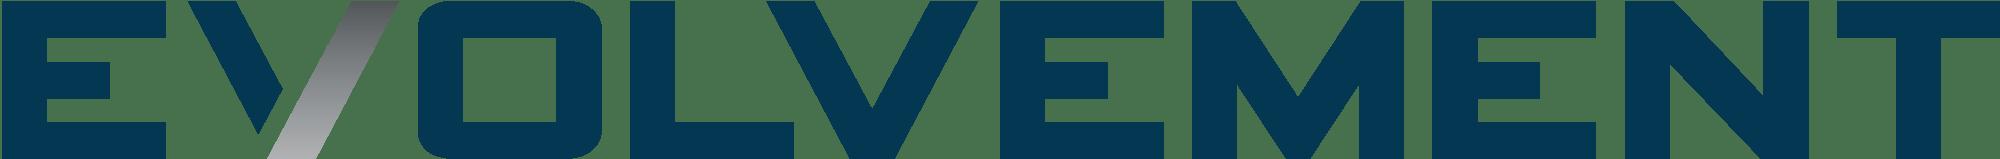 Evolvement Networks